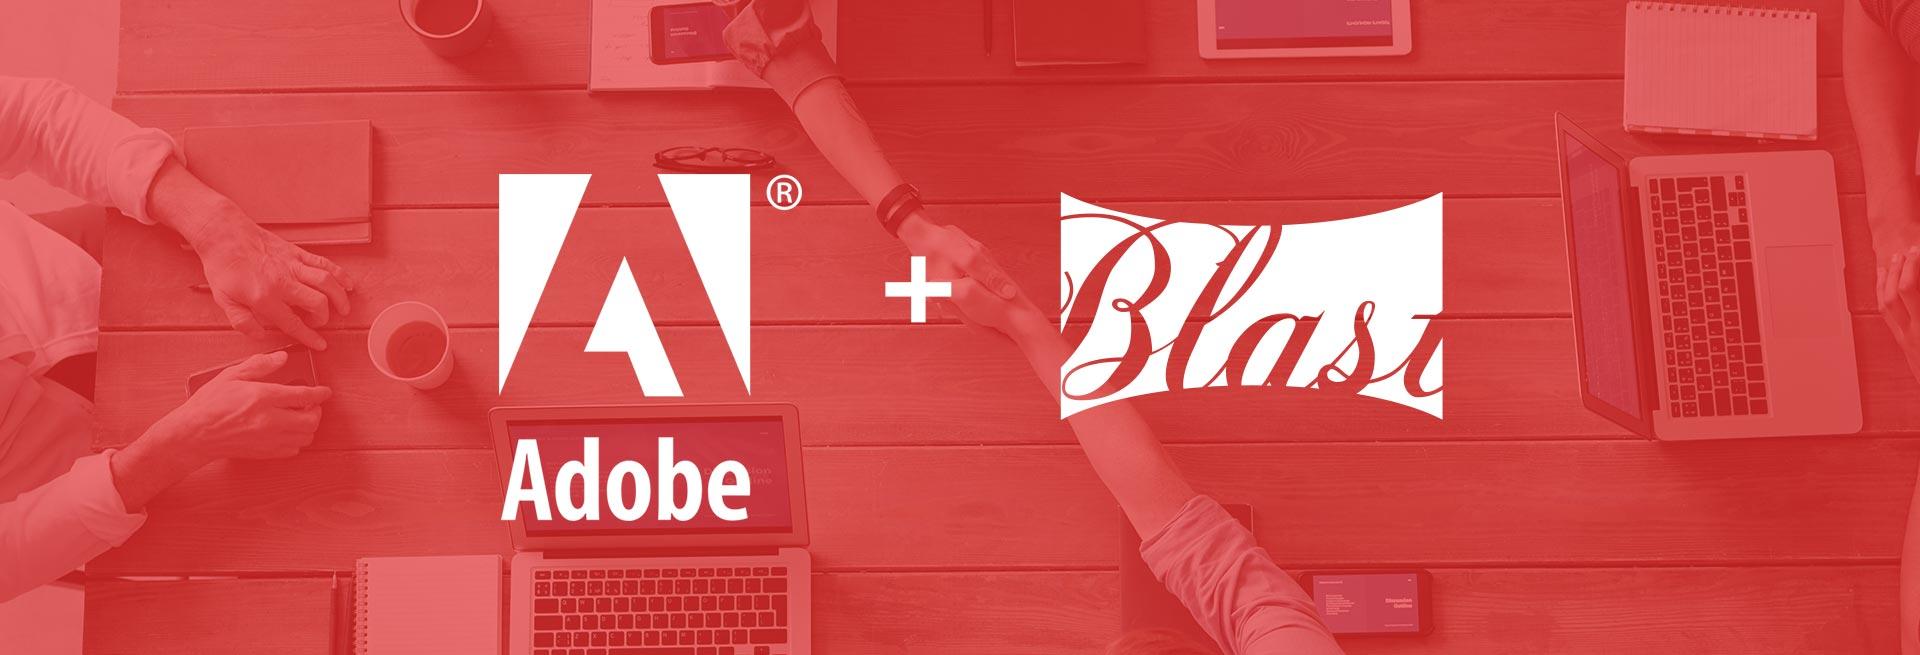 adobe and blast partnership